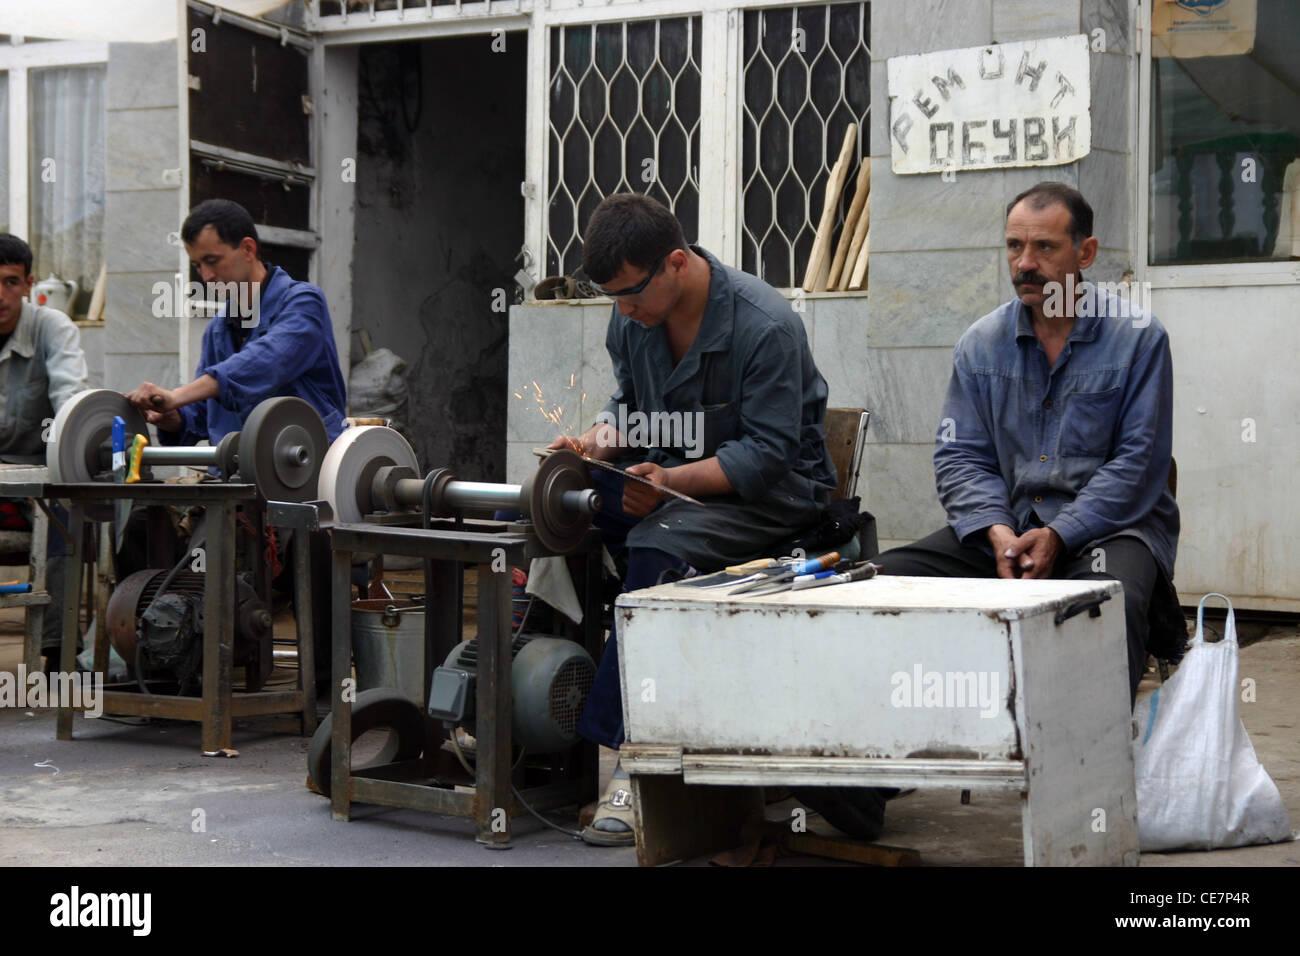 L'uomo affilatura utensili in Samarcanda, Uzbekistan Immagini Stock